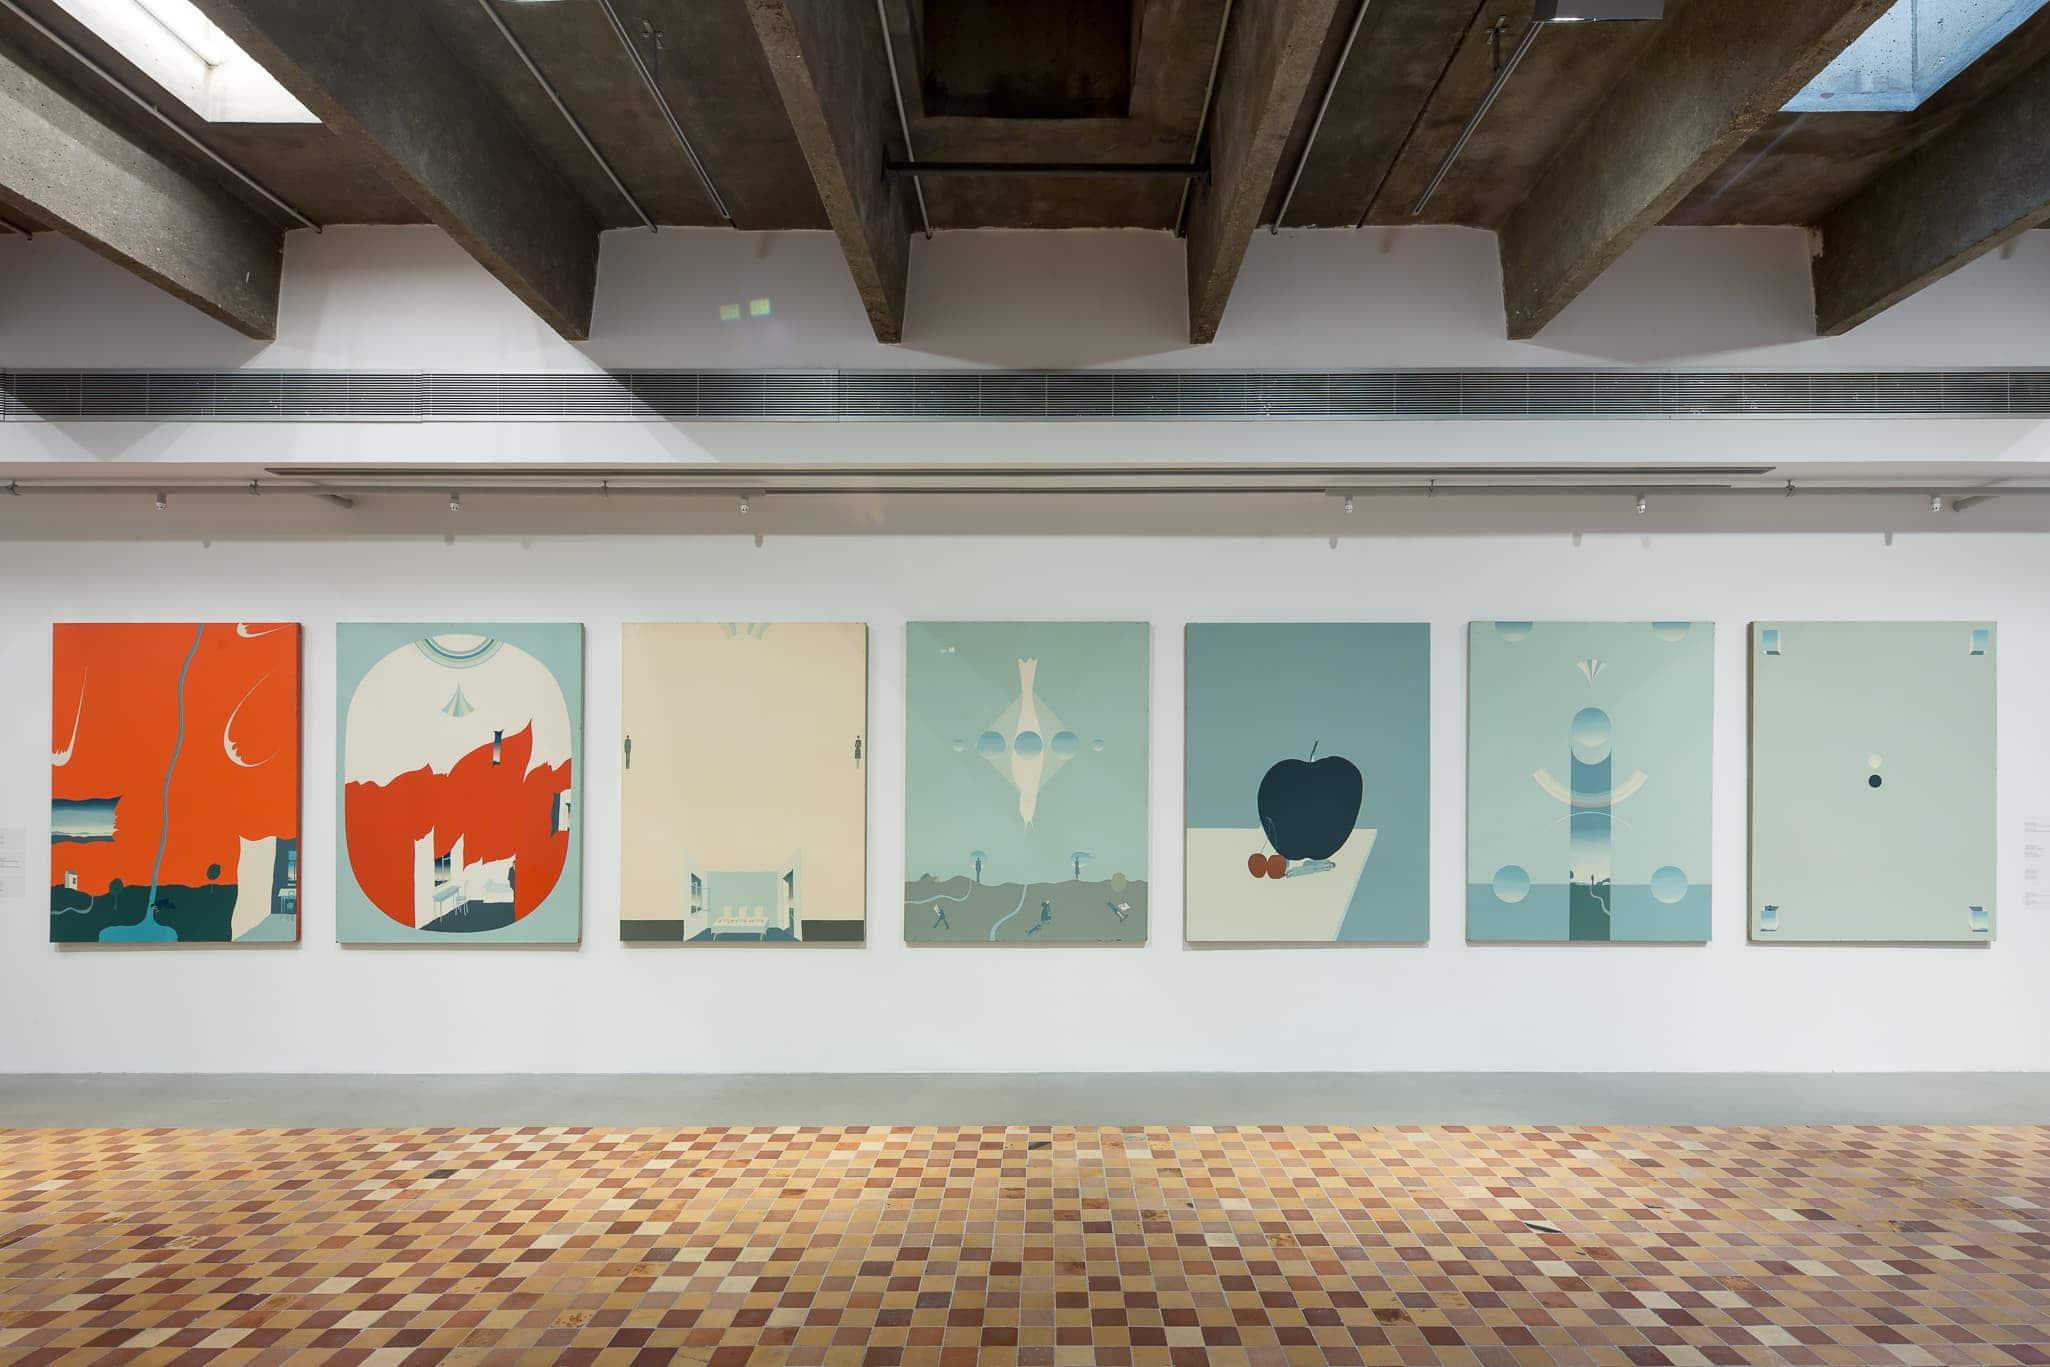 Exhibition of Viktor Pivovarov at Garage Museum of Contemporary Art, via oalexeyenko.com